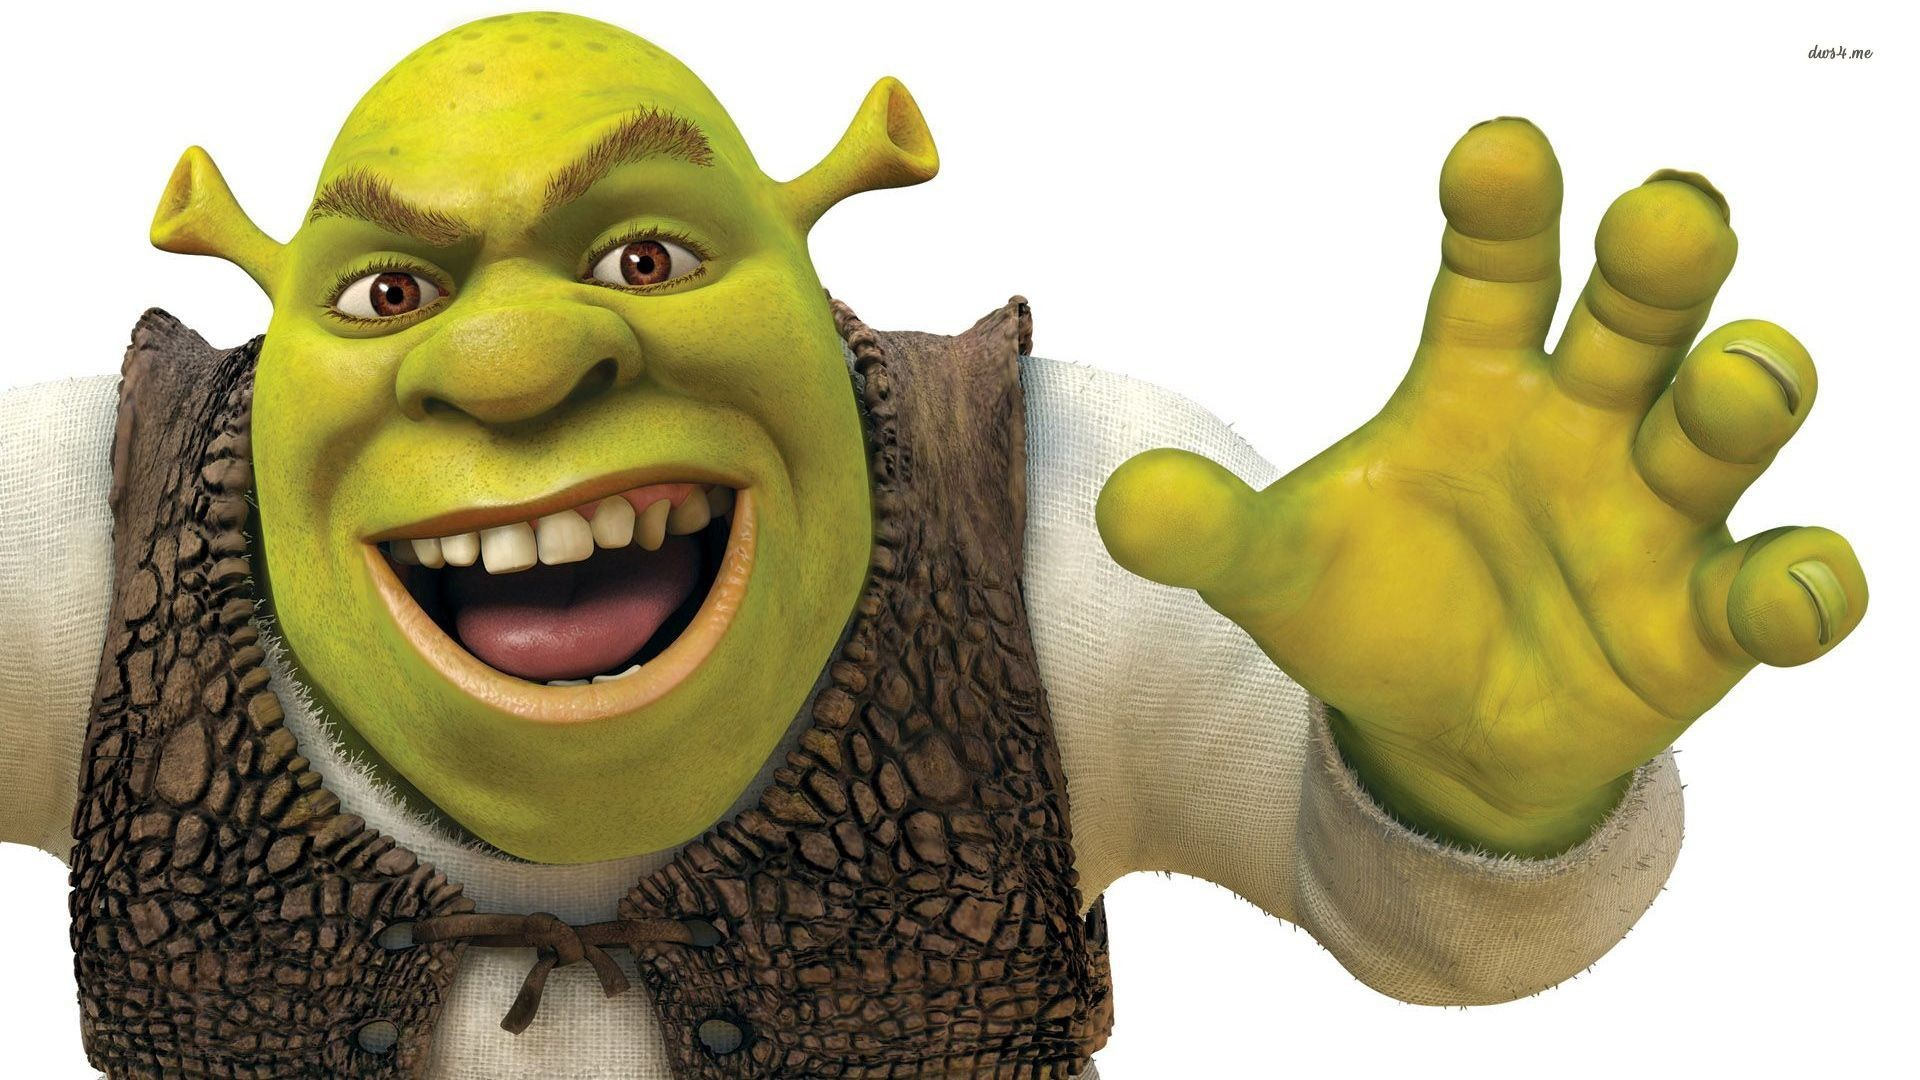 Shrek Wallpaper (70+ pictures)